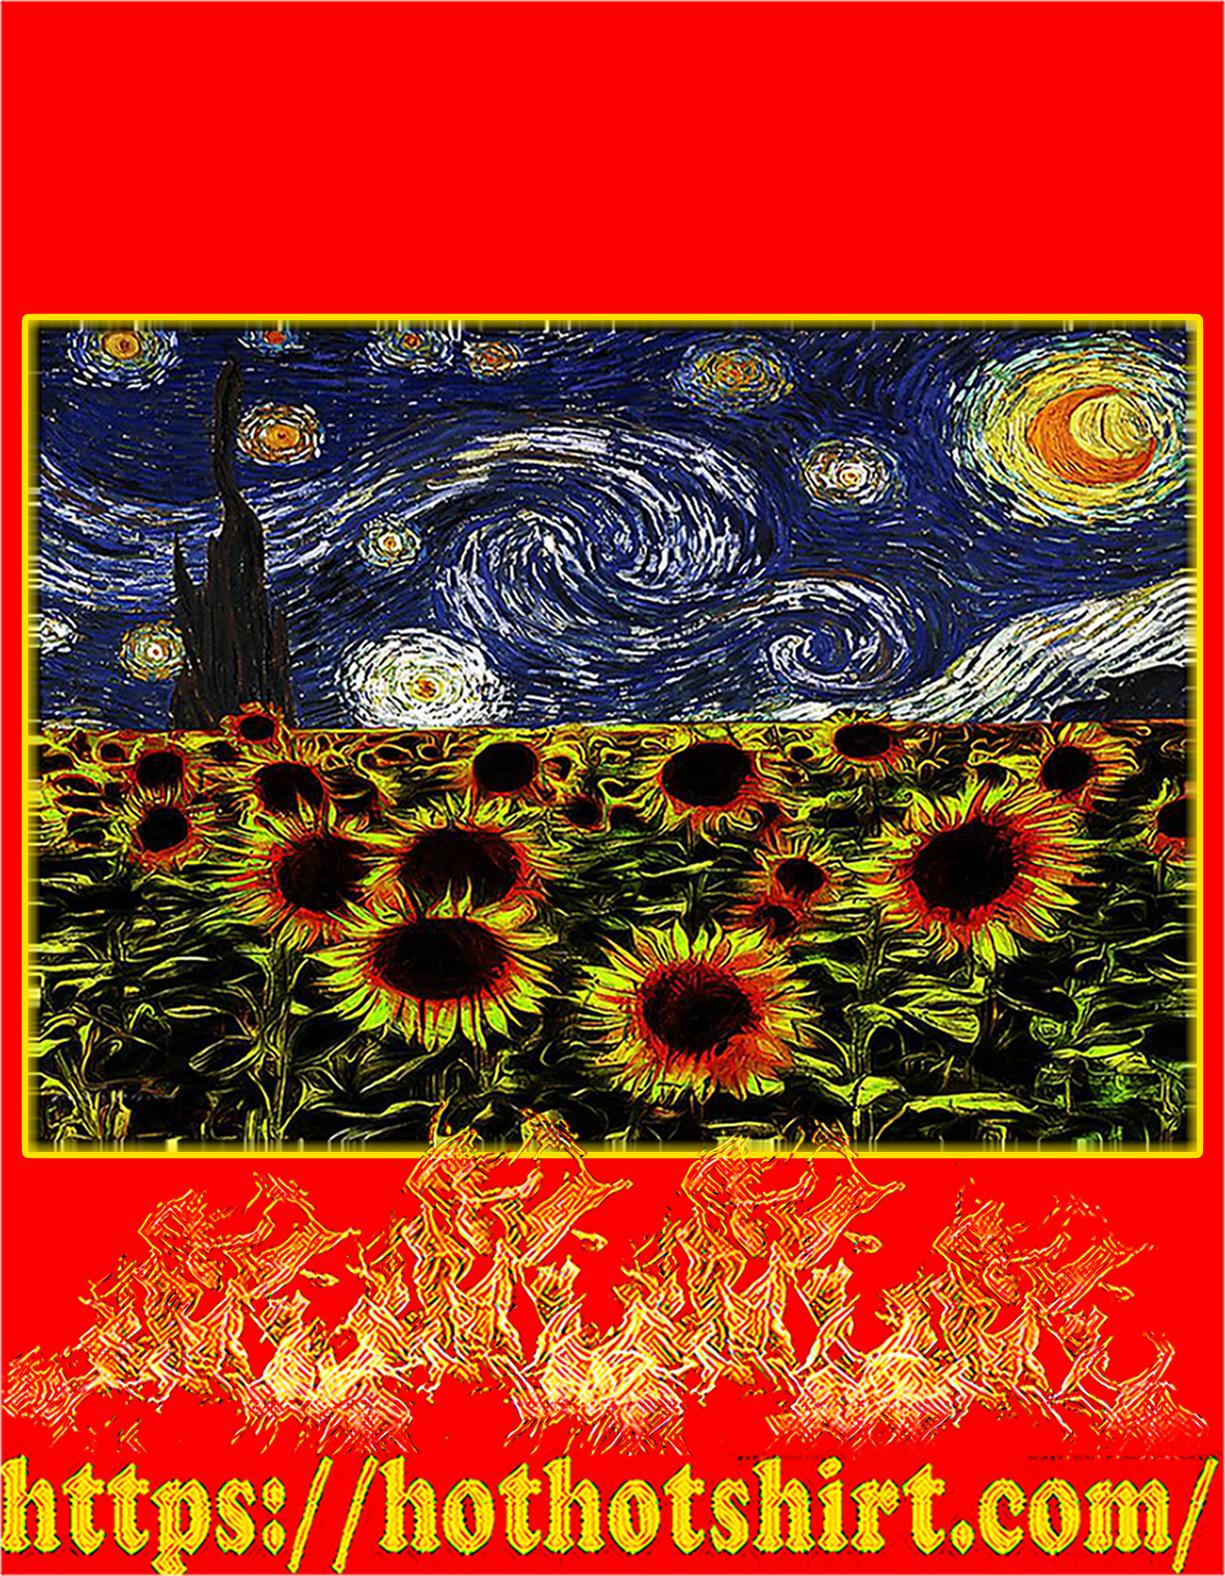 Sunflowers starry night van gogh poster - A4